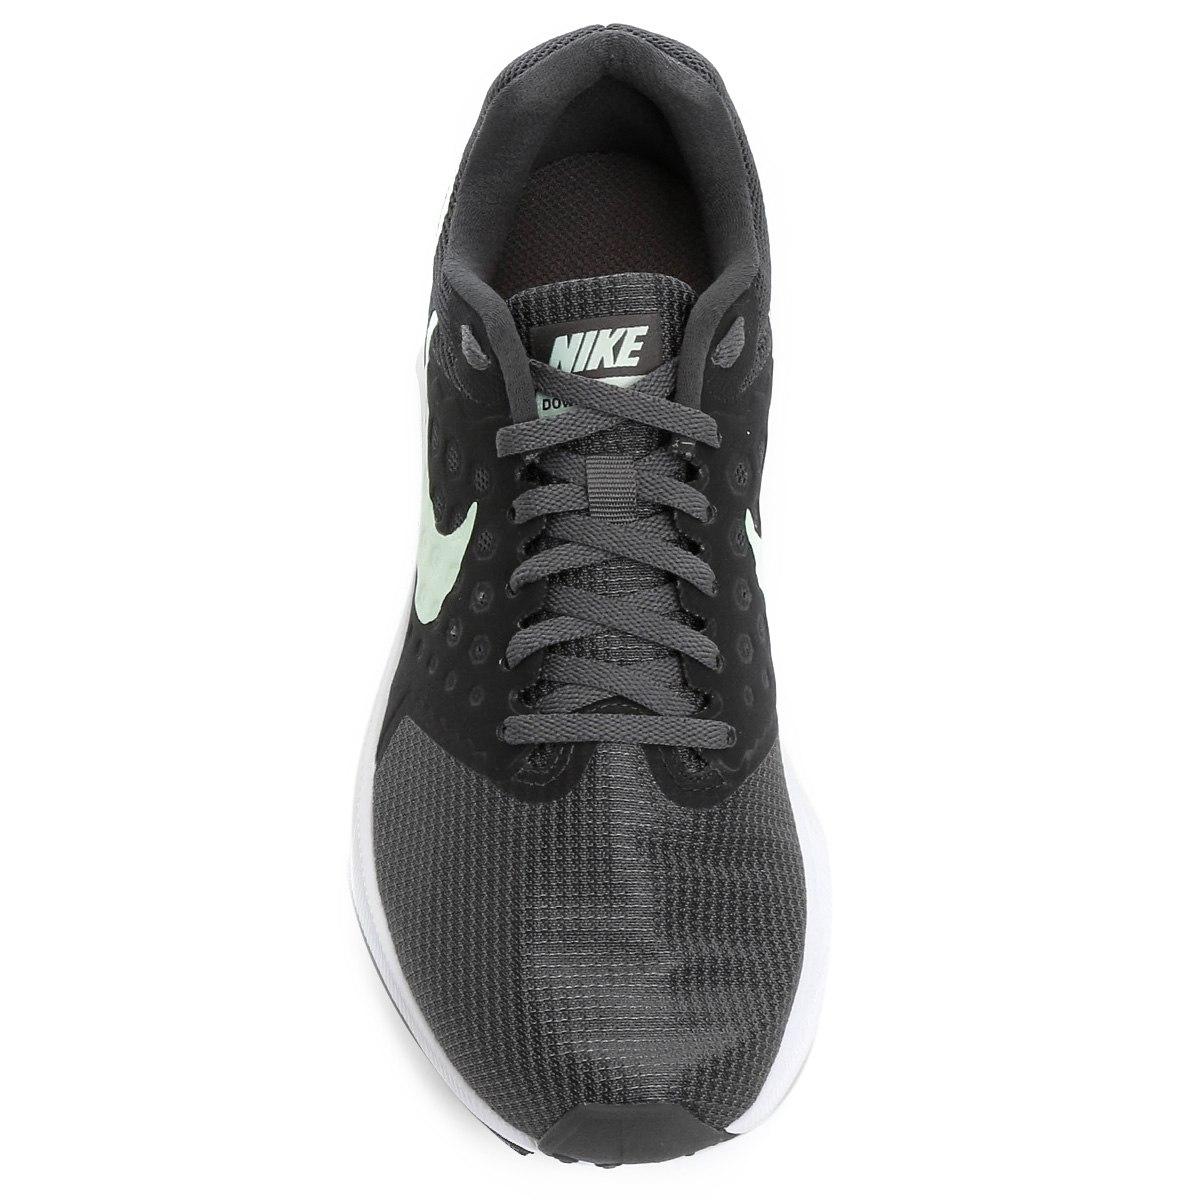 Tênis Nike Downshifter 7 Feminino - Chumbo/Verde